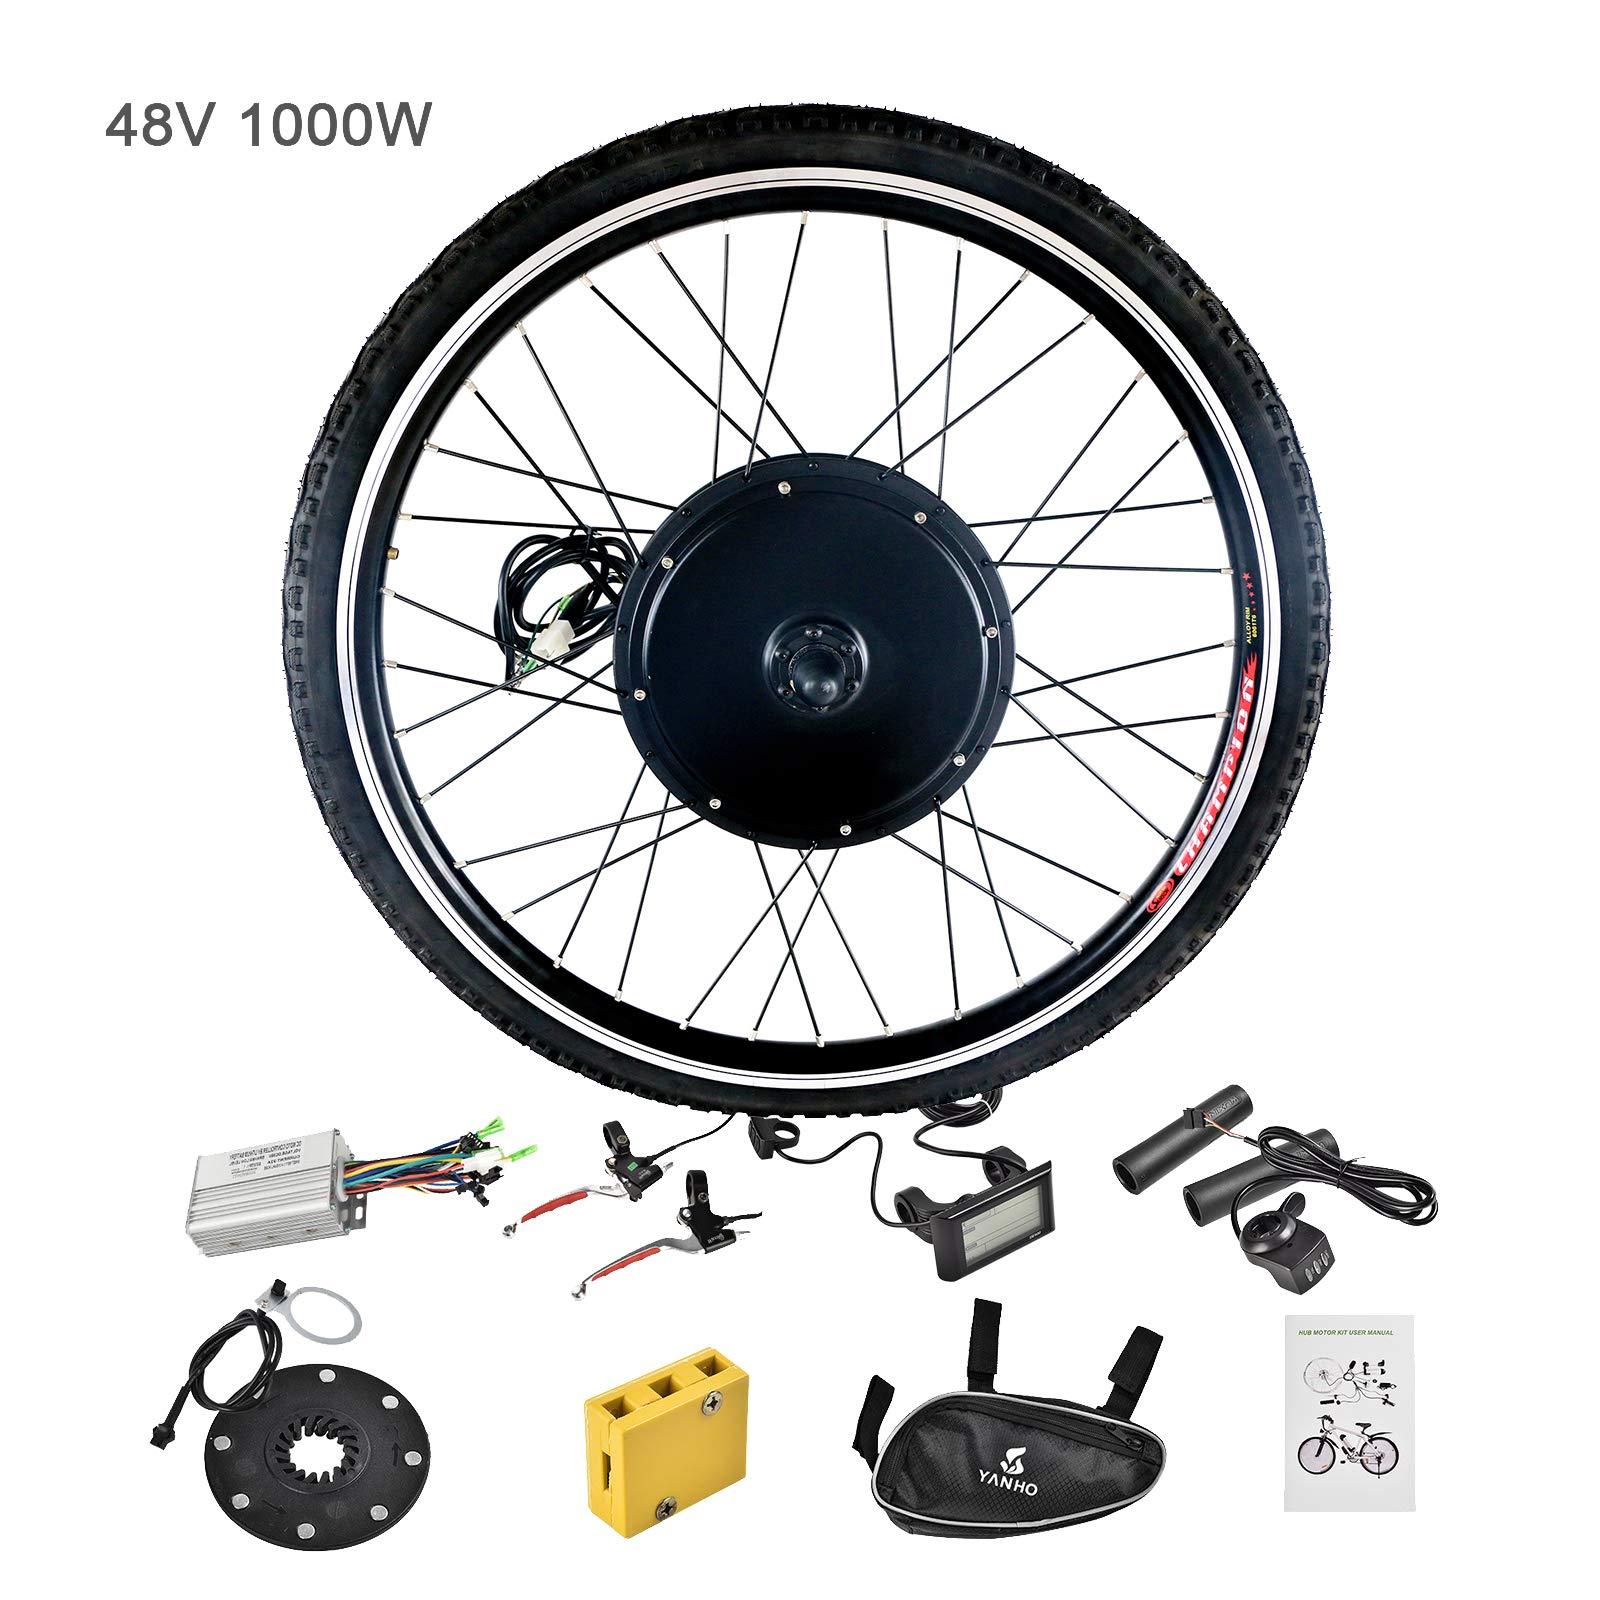 Murtisol Electric Bicycle Motor Conversion Kit-LCD Meter 48V 1000W 26'' Front Wheel E-Bike